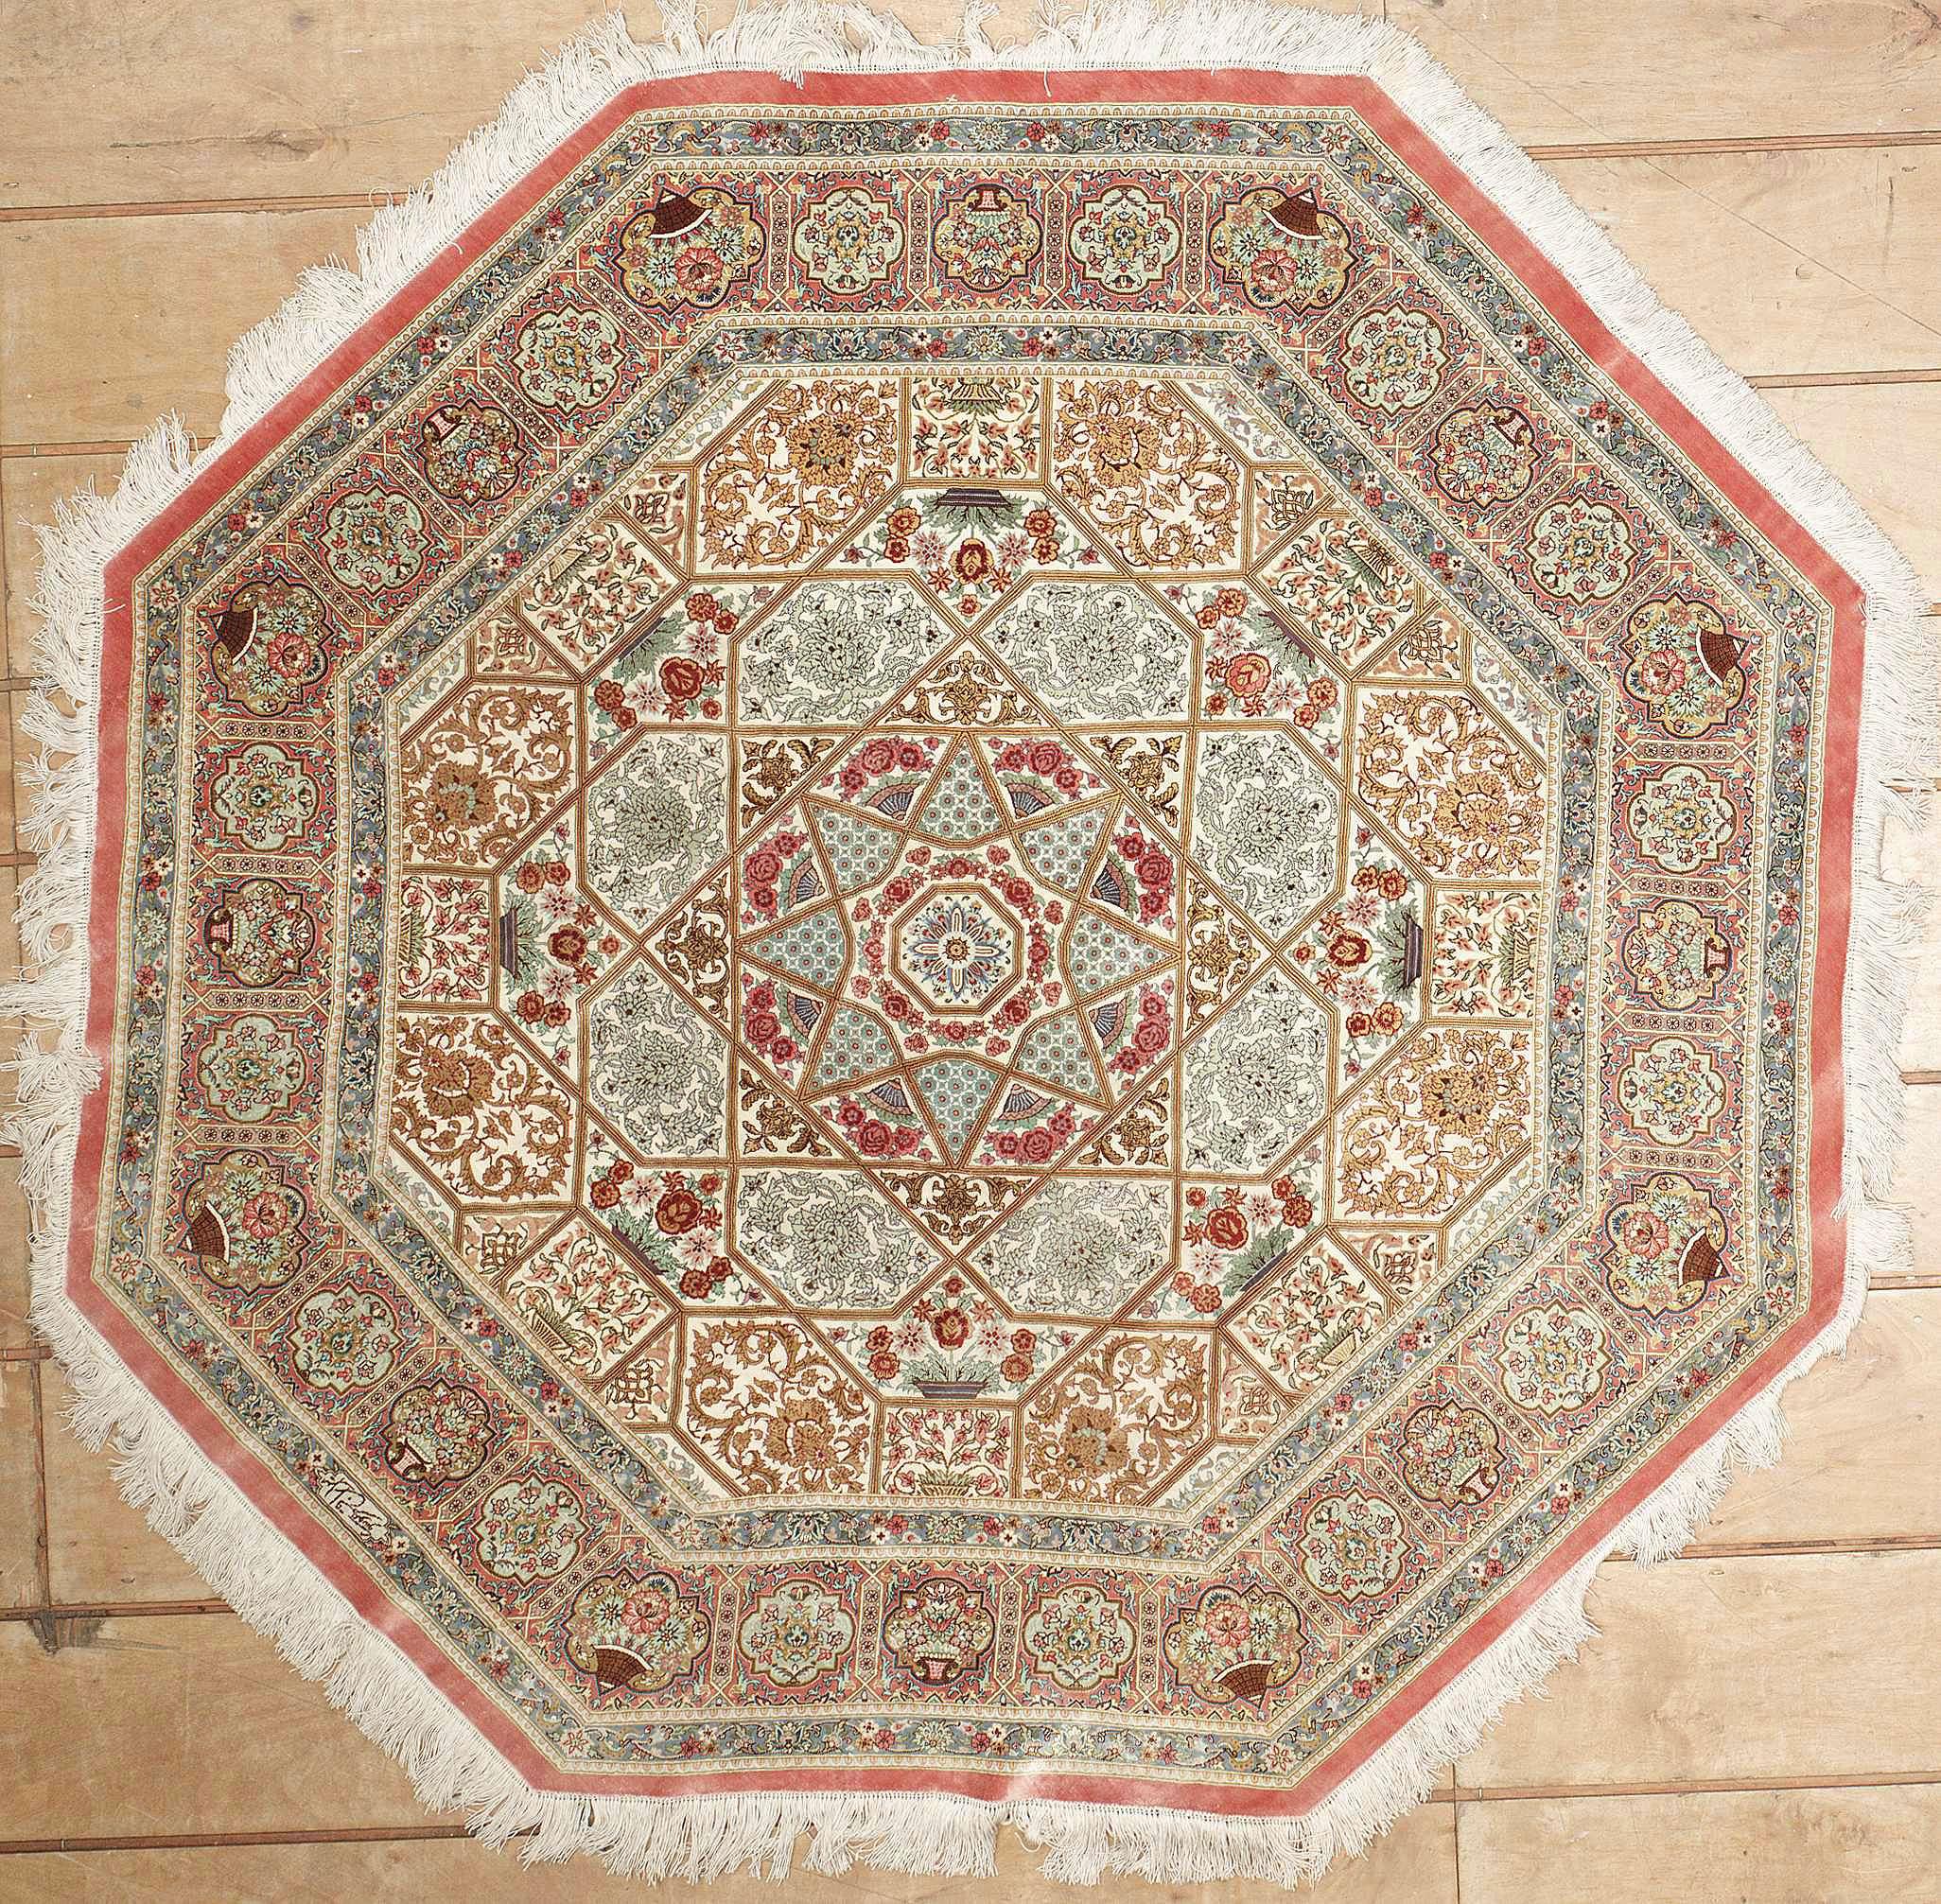 5x5 square area rug